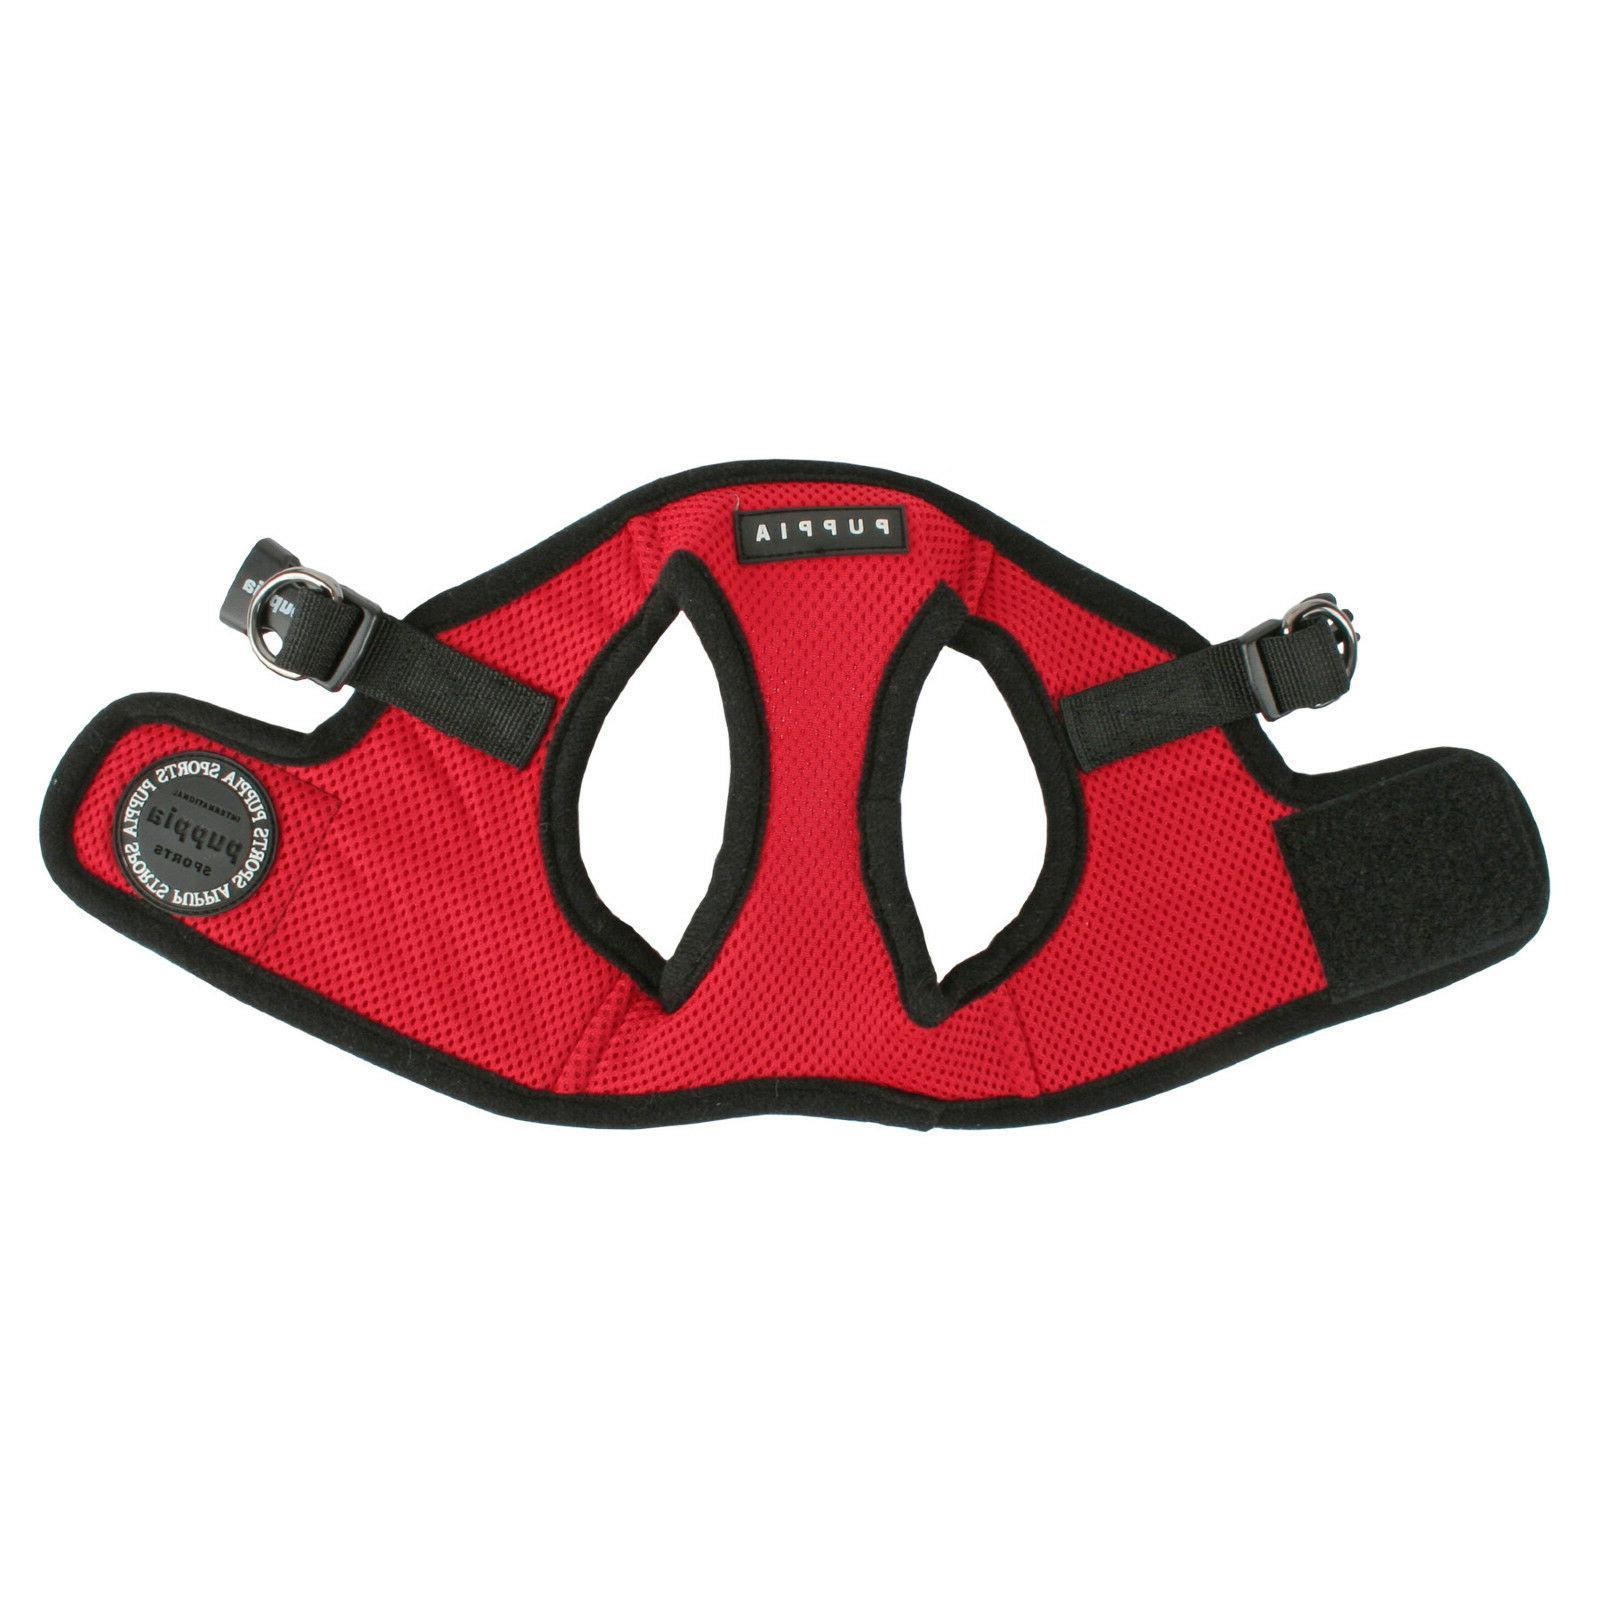 Puppia® Mesh Breathable Dog Harness - S M, L, XL, AH305